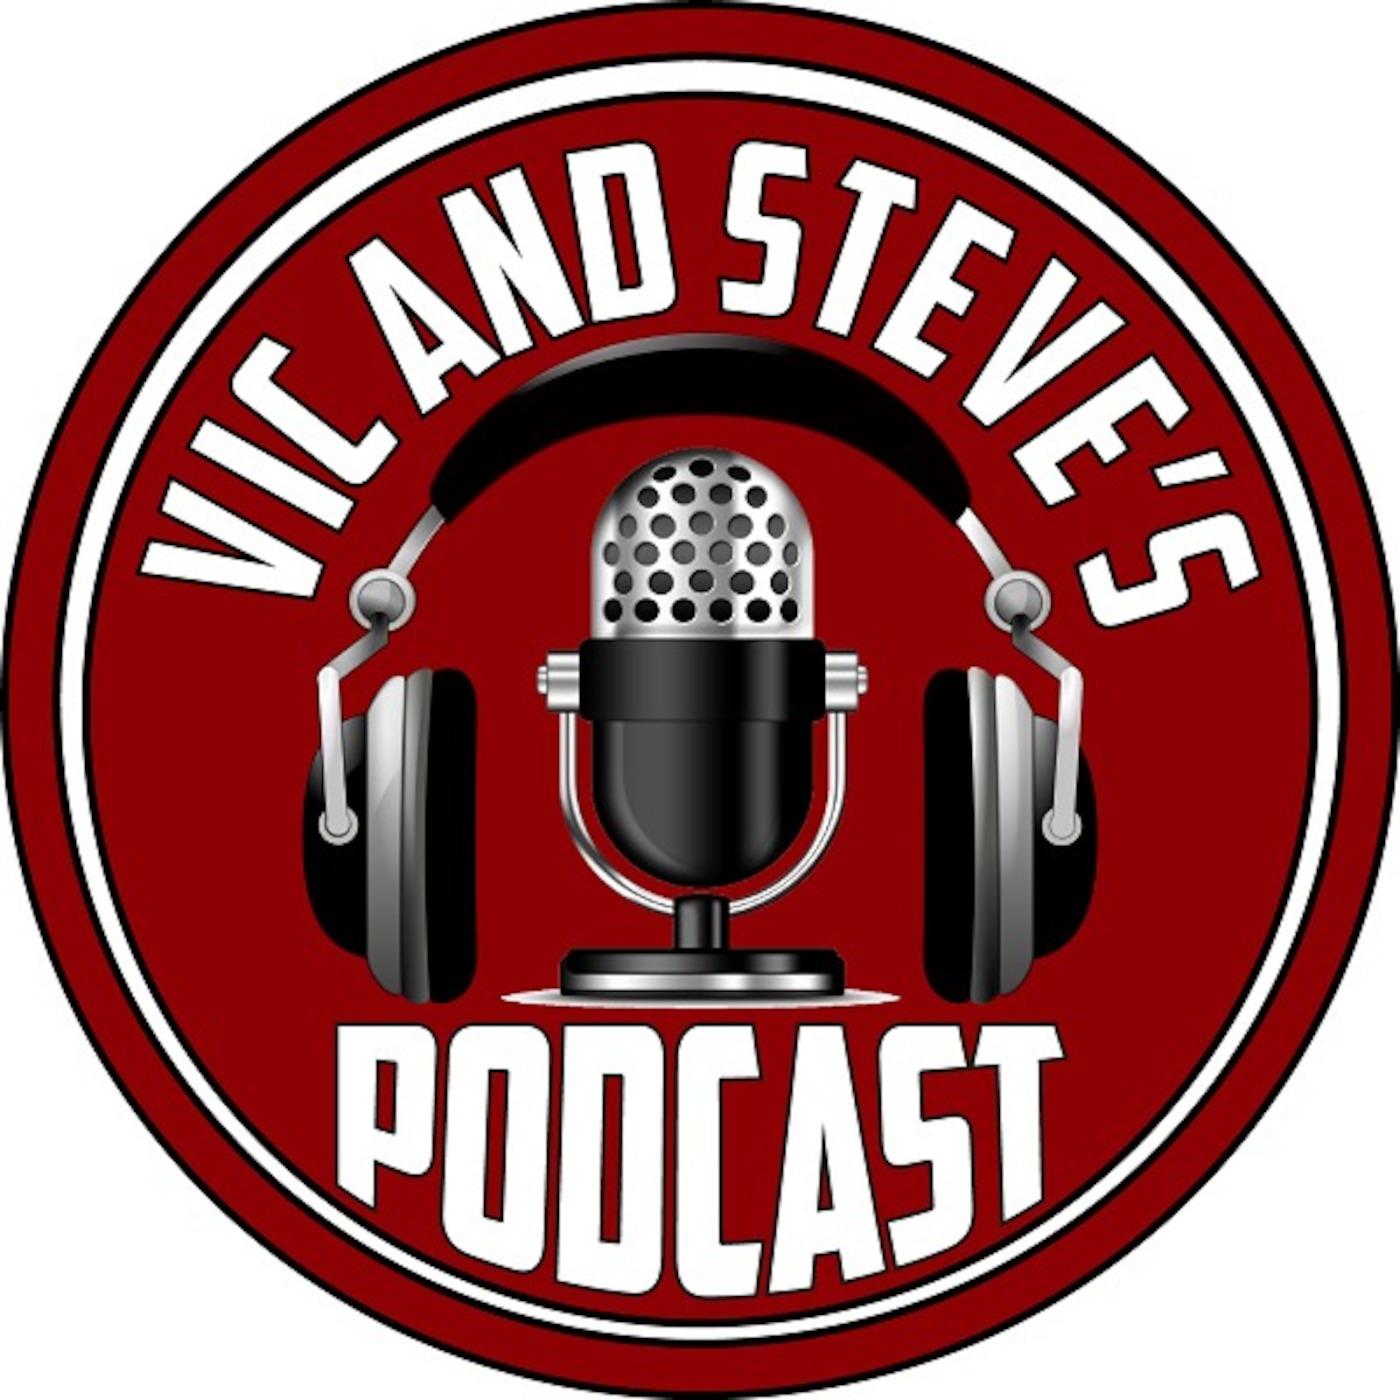 2 - Never Break Up Over Yogurt / Veronica's Episode VIC AND STEVE'S